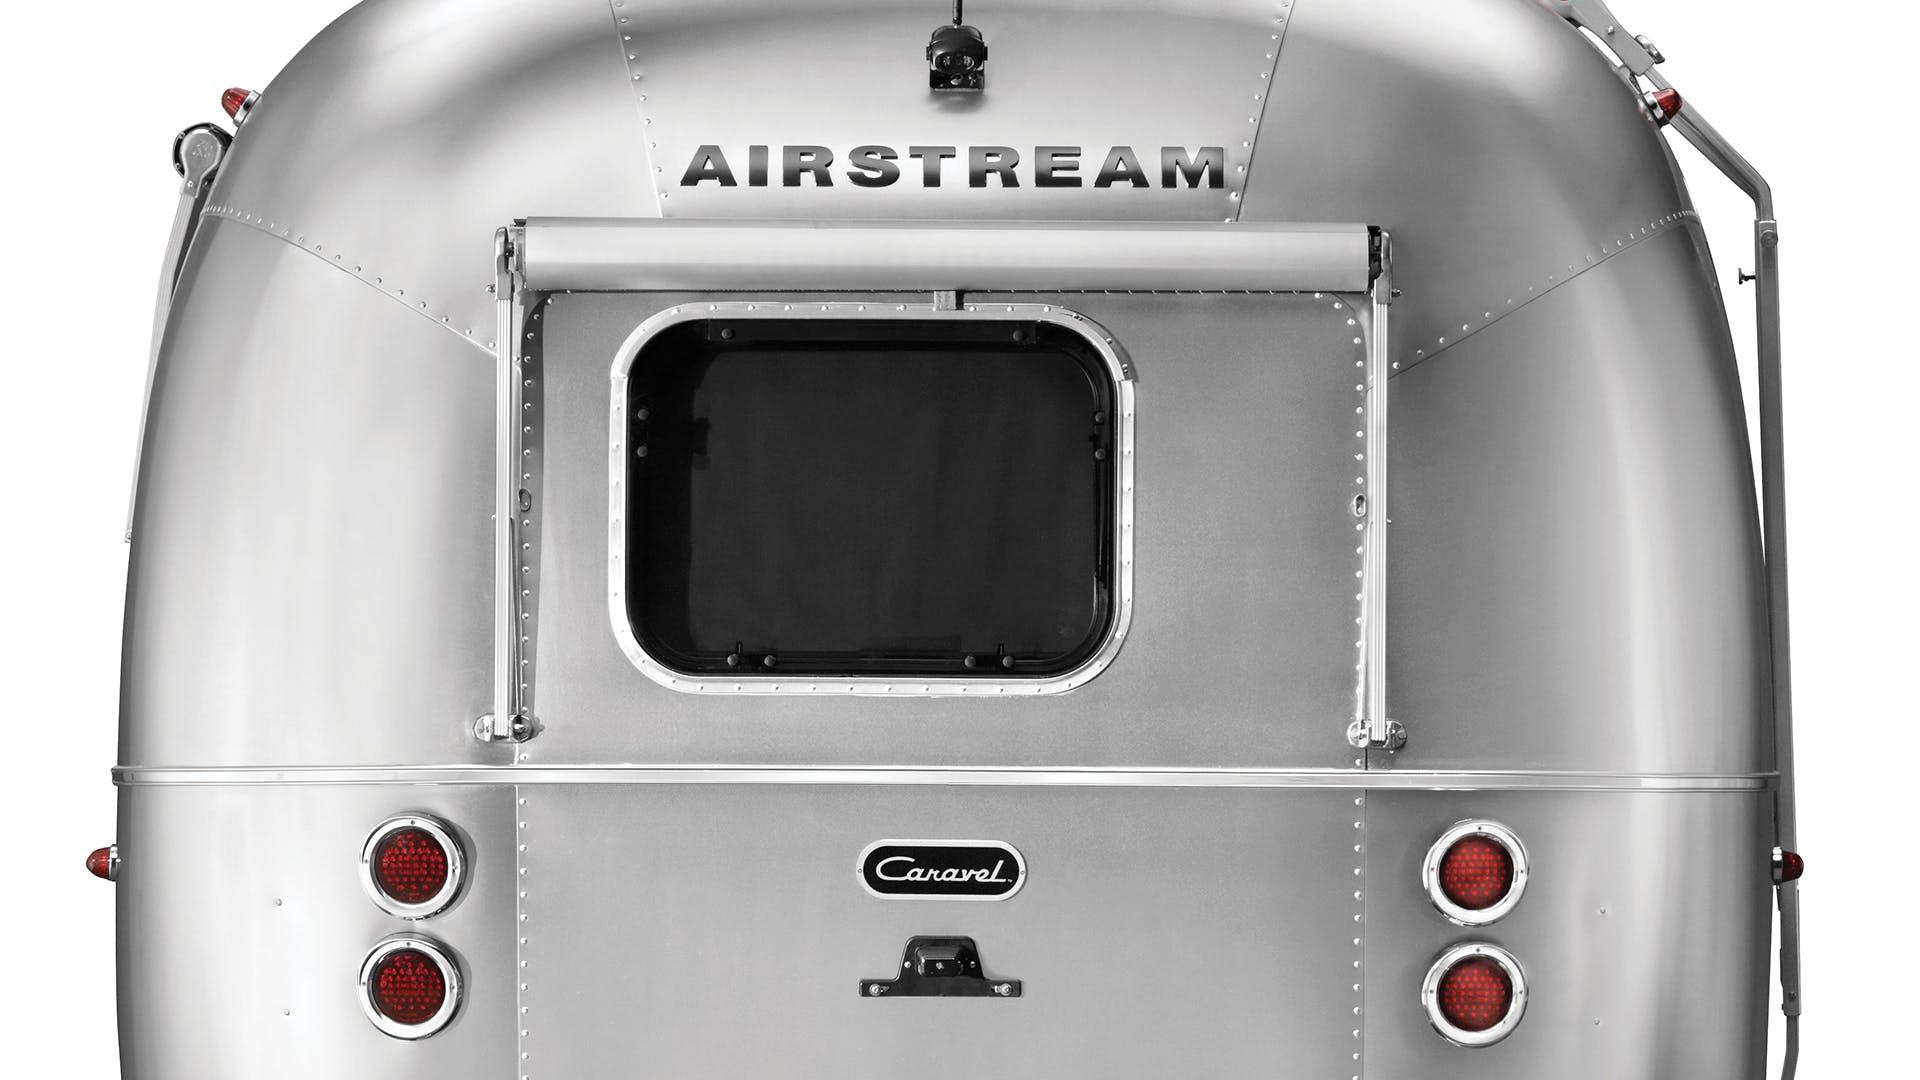 Airstream Caravel 22FB Rear Exterior